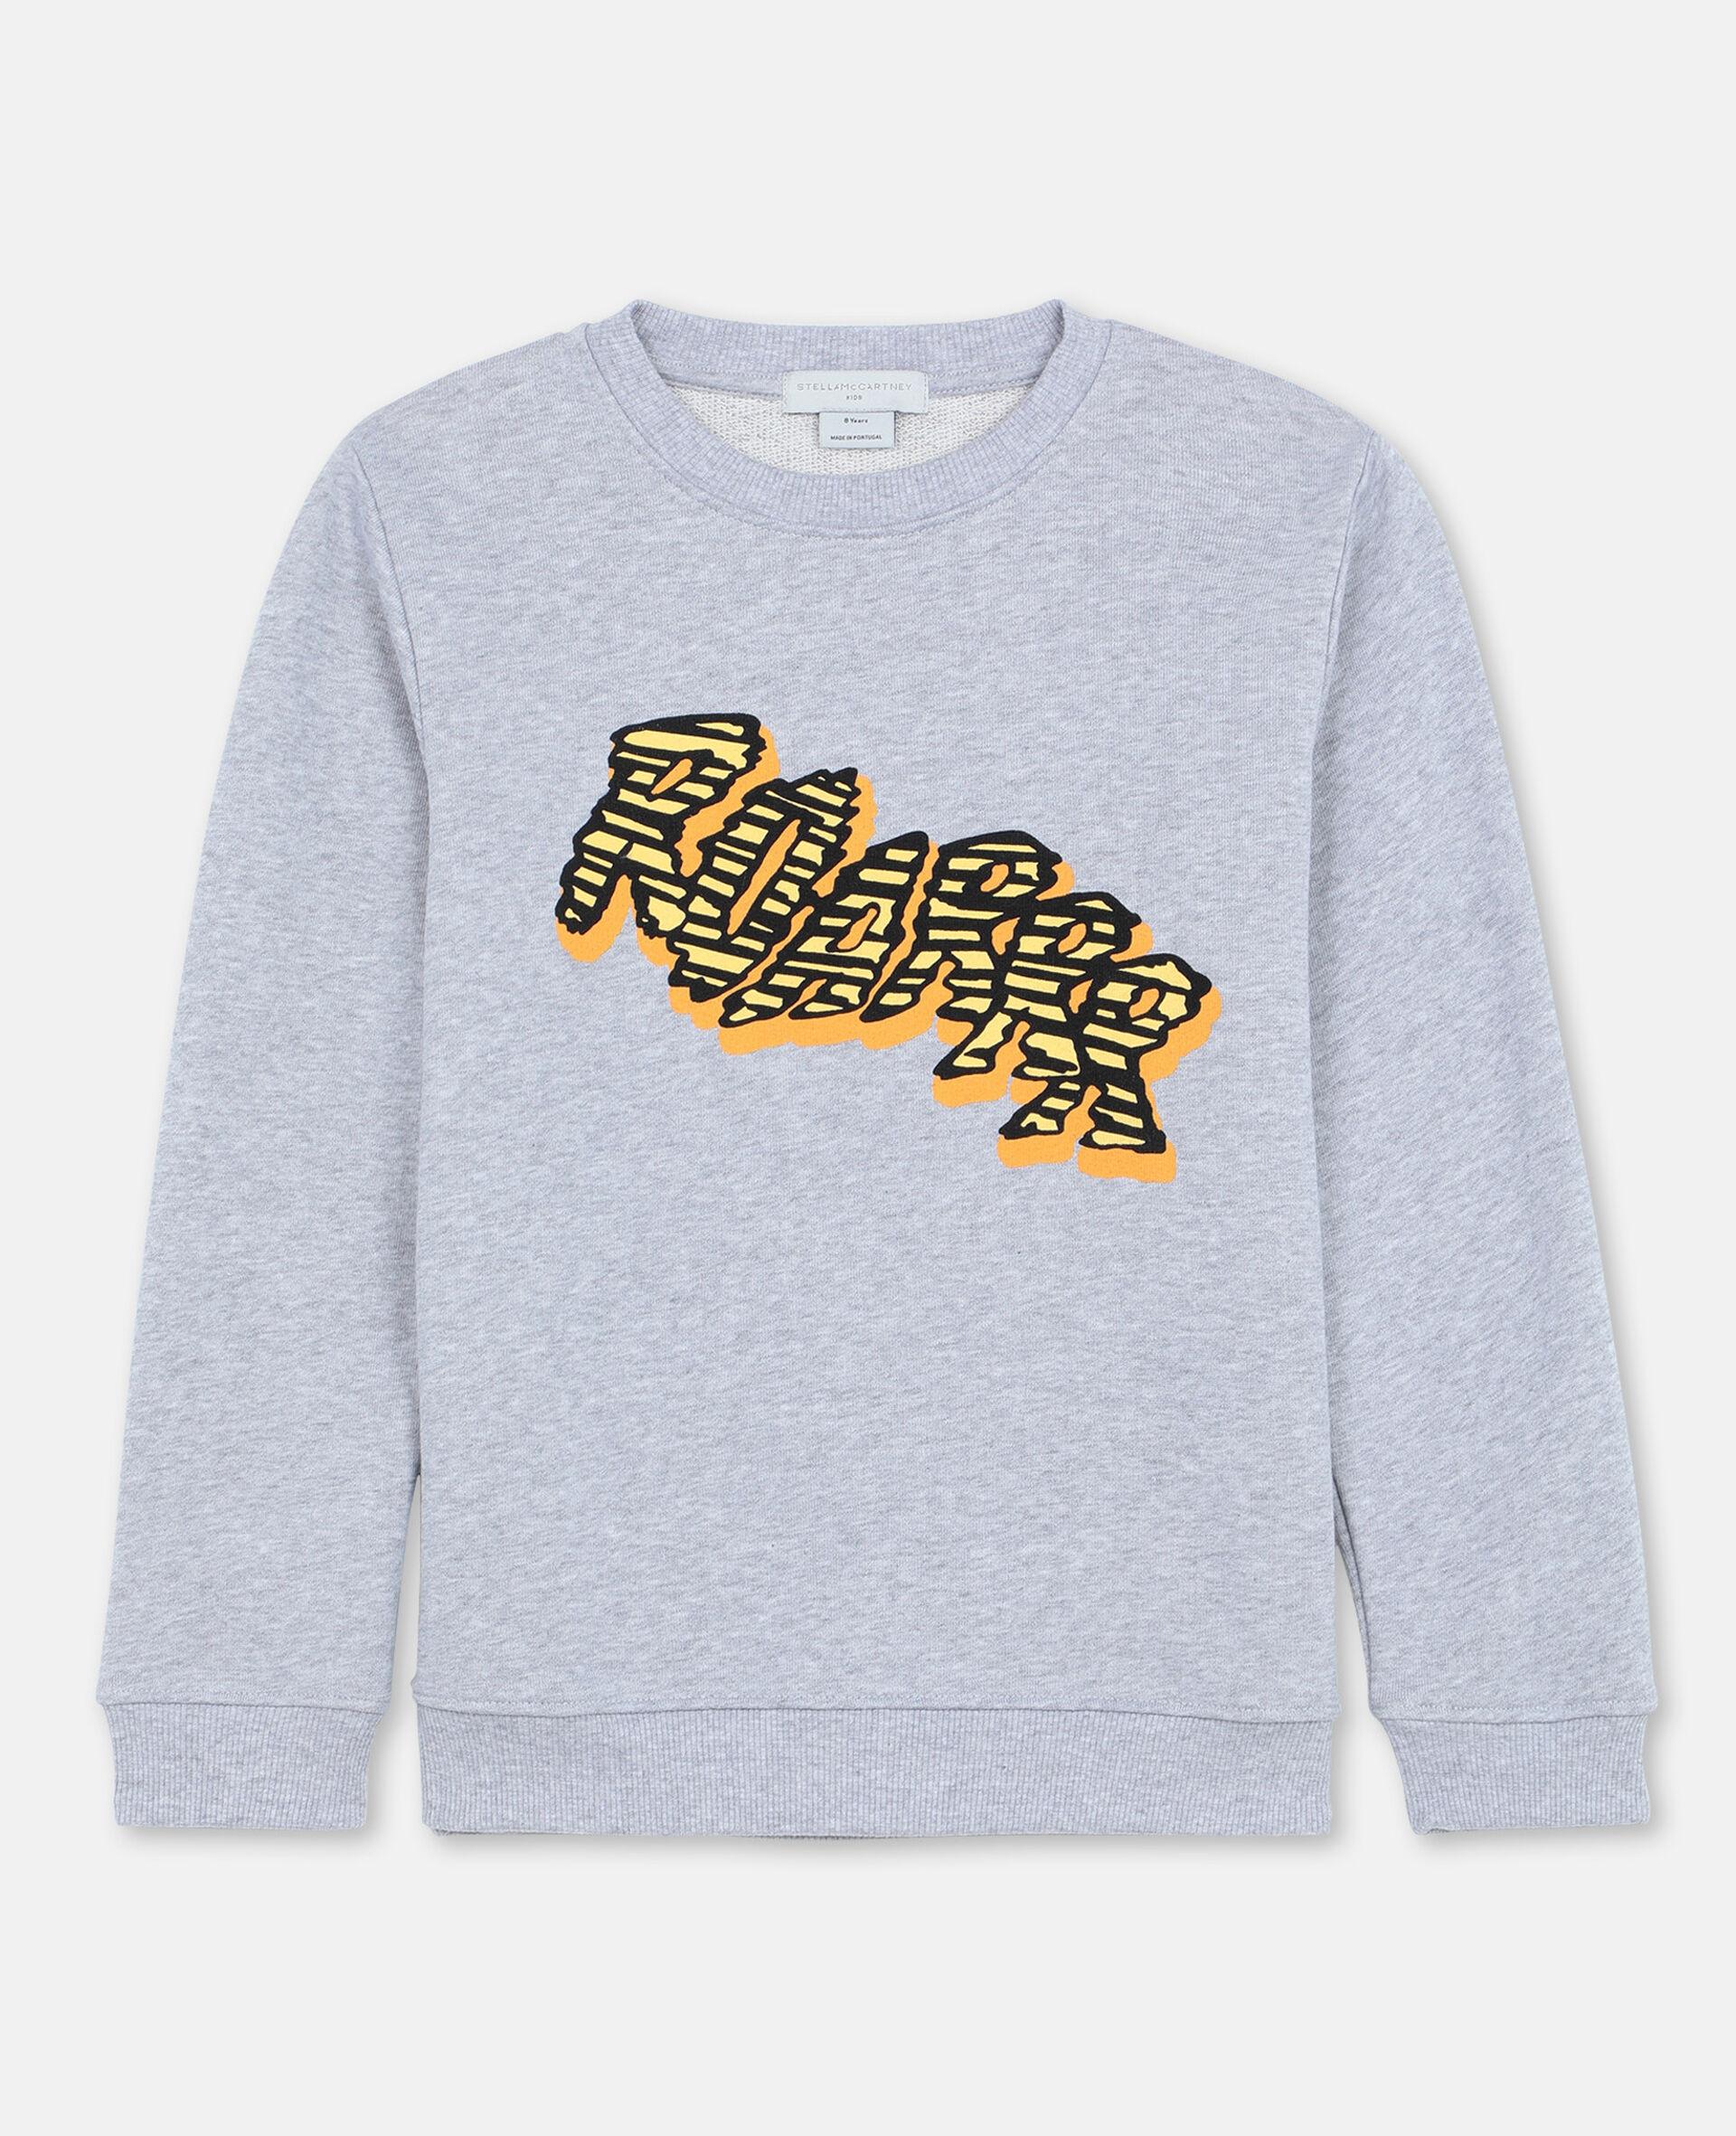 Roarrr Cotton Sweatshirt -Grey-large image number 0